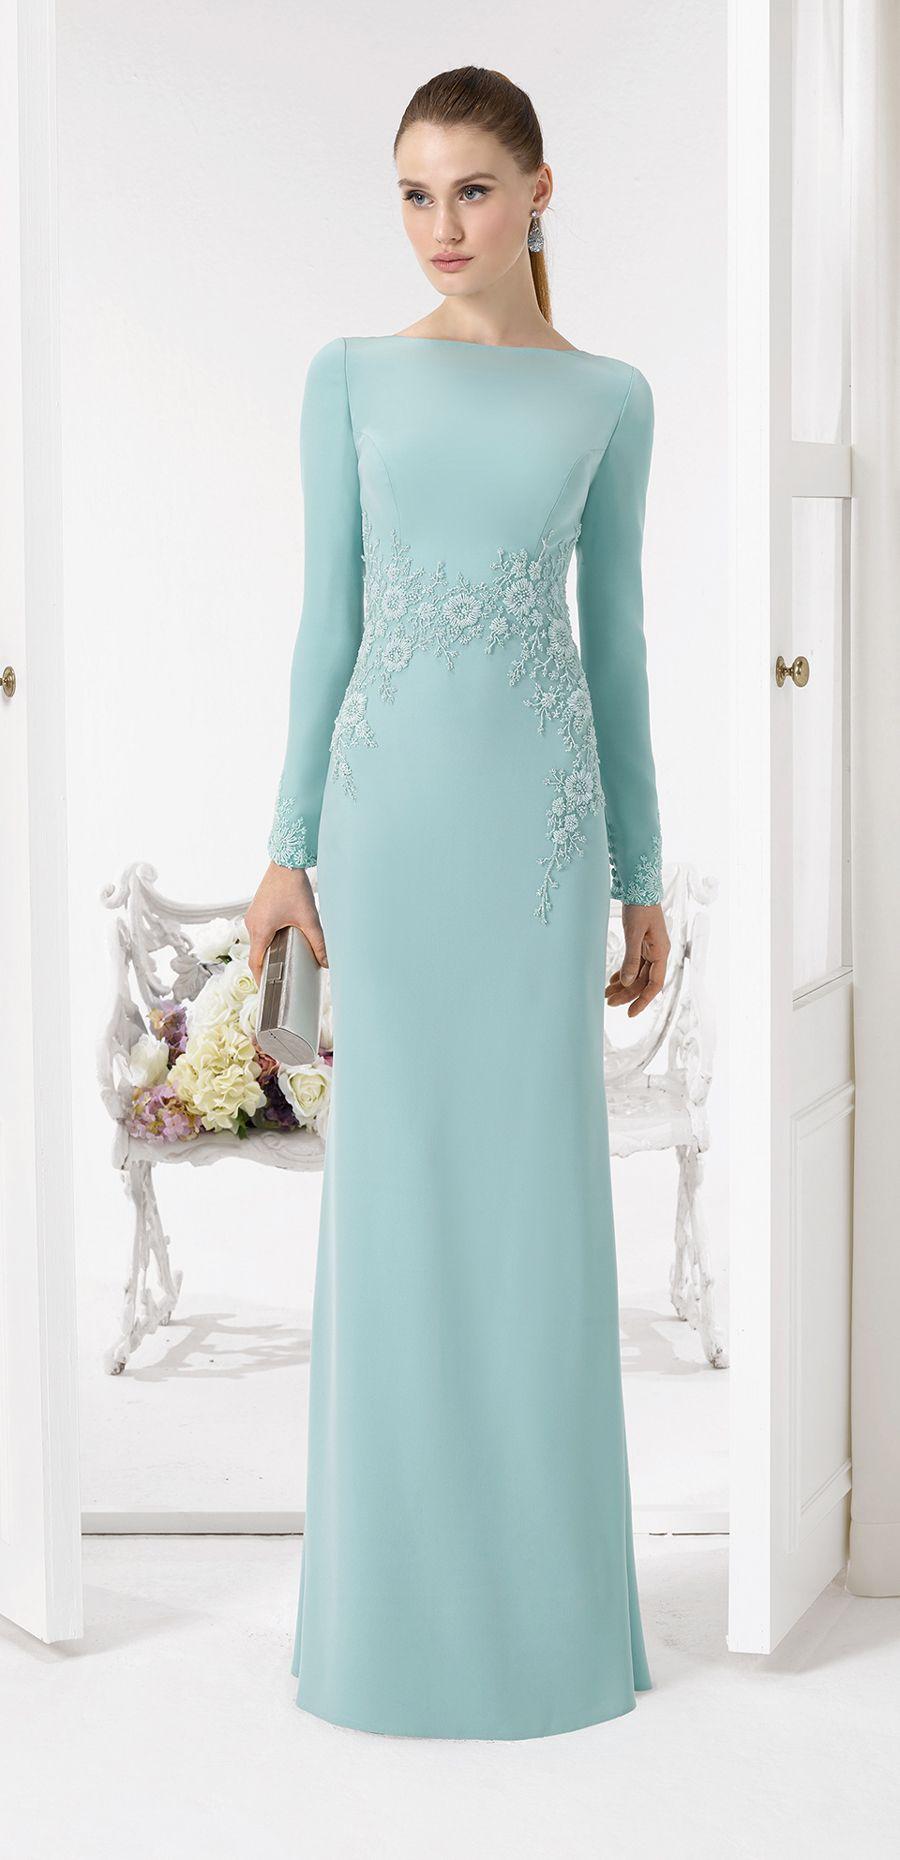 Maxi dress women fashion outfit clothing new style | Girls Maxi ...